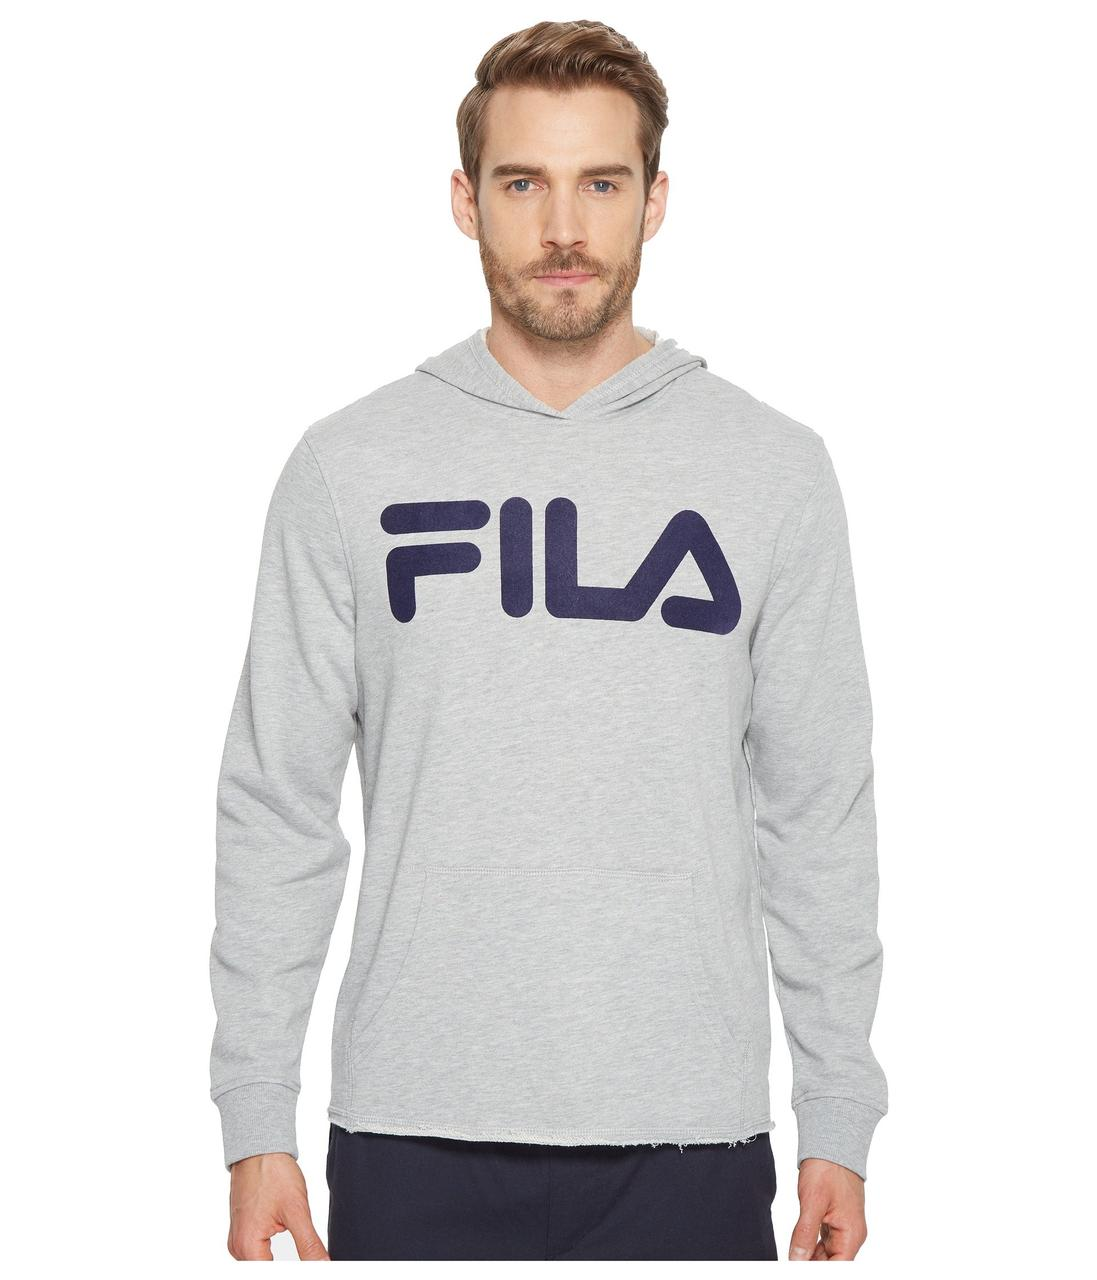 73772ef5 Толстовка Fila Locker Room Hoodie Grey Heather/Navy - Оригинал - FAIR -  оригинальная одежда